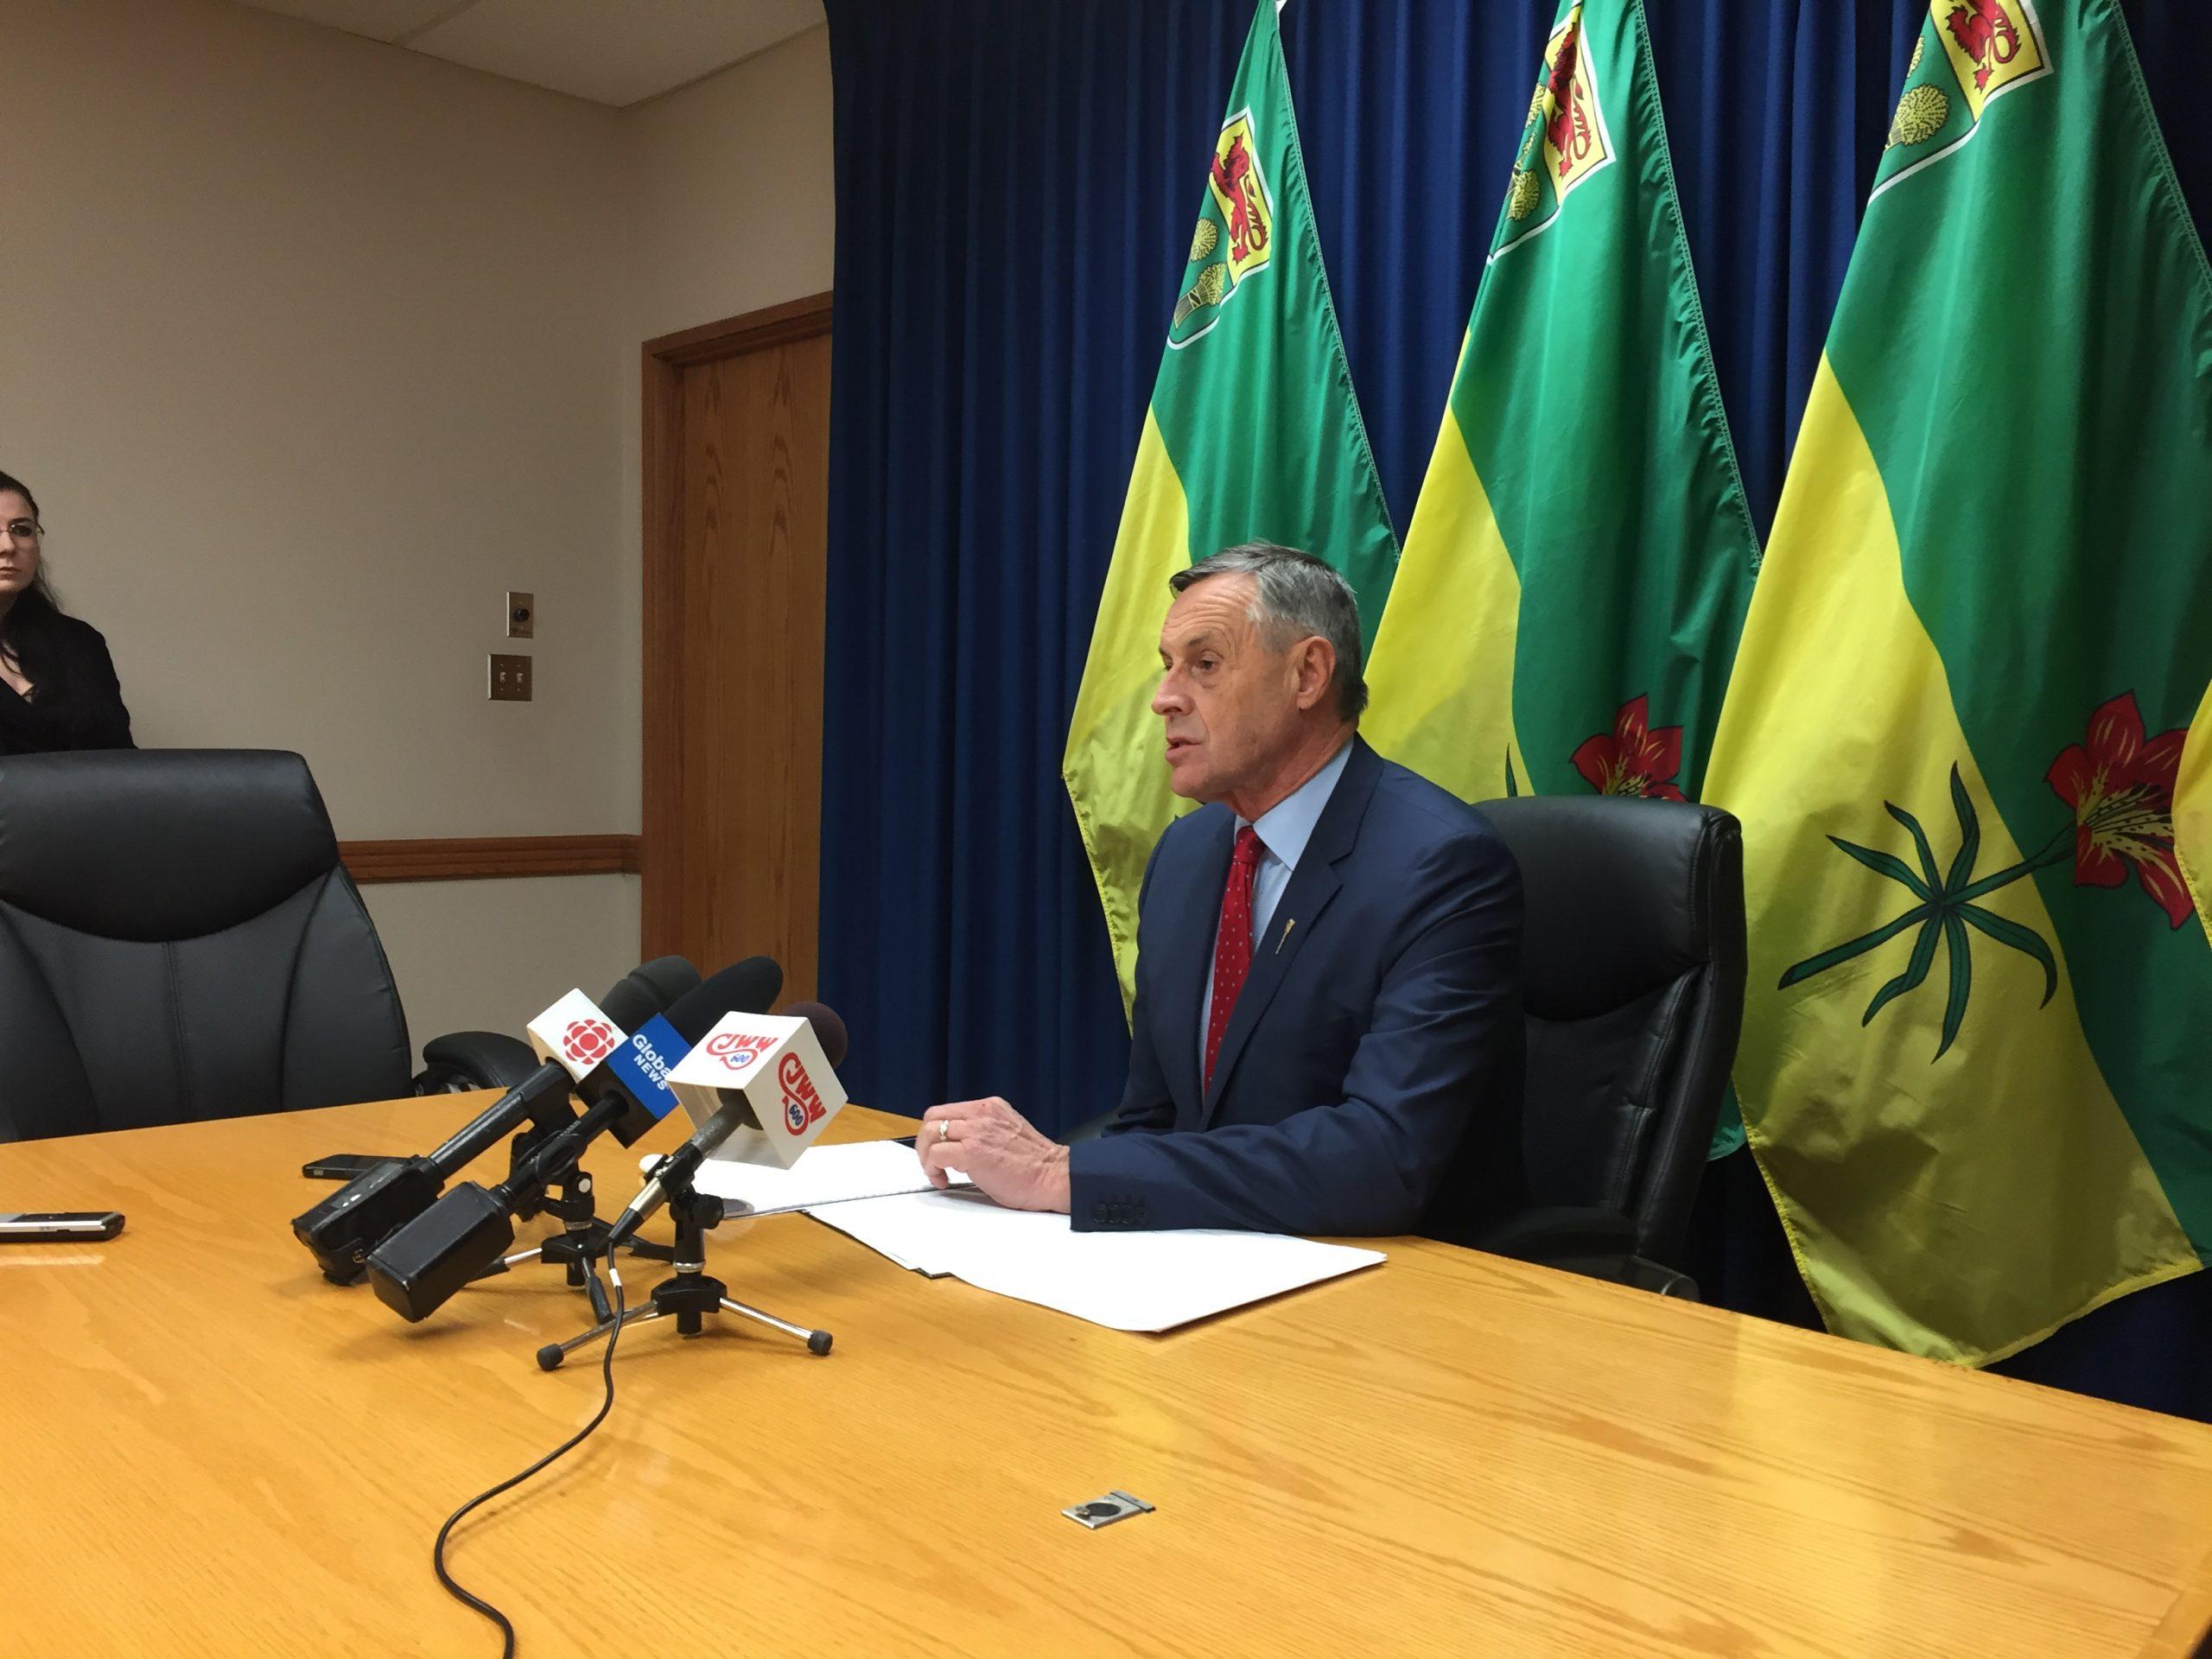 More Groups File For Intervener Status in Saskatchewan Carbon Tax Case